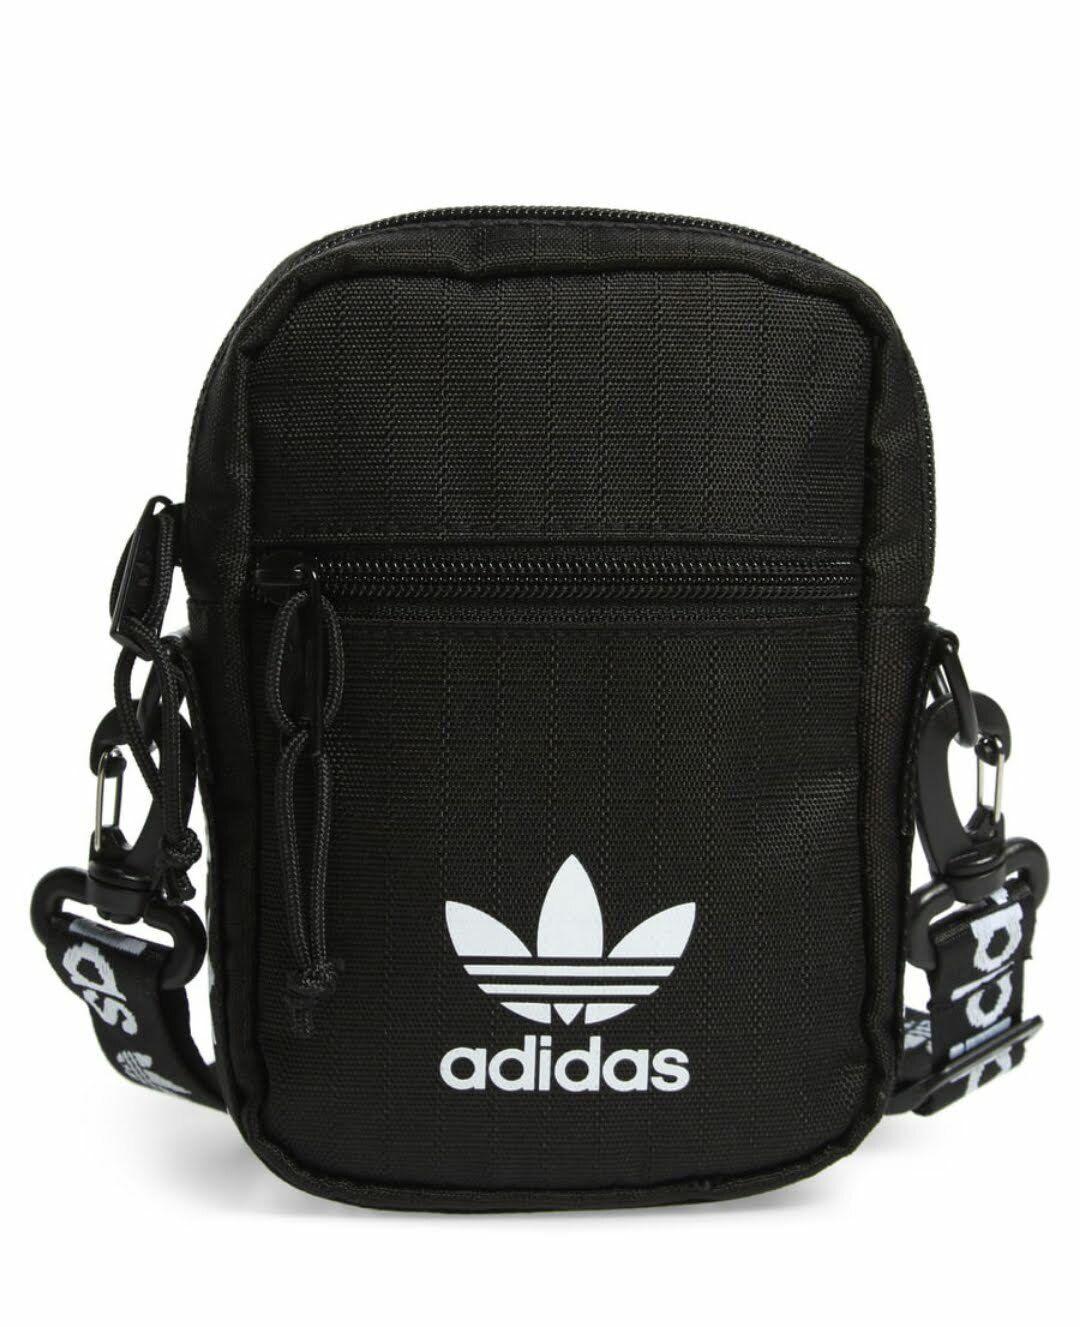 adidas Originals Festival Crossbody Bag Black One Size Mini